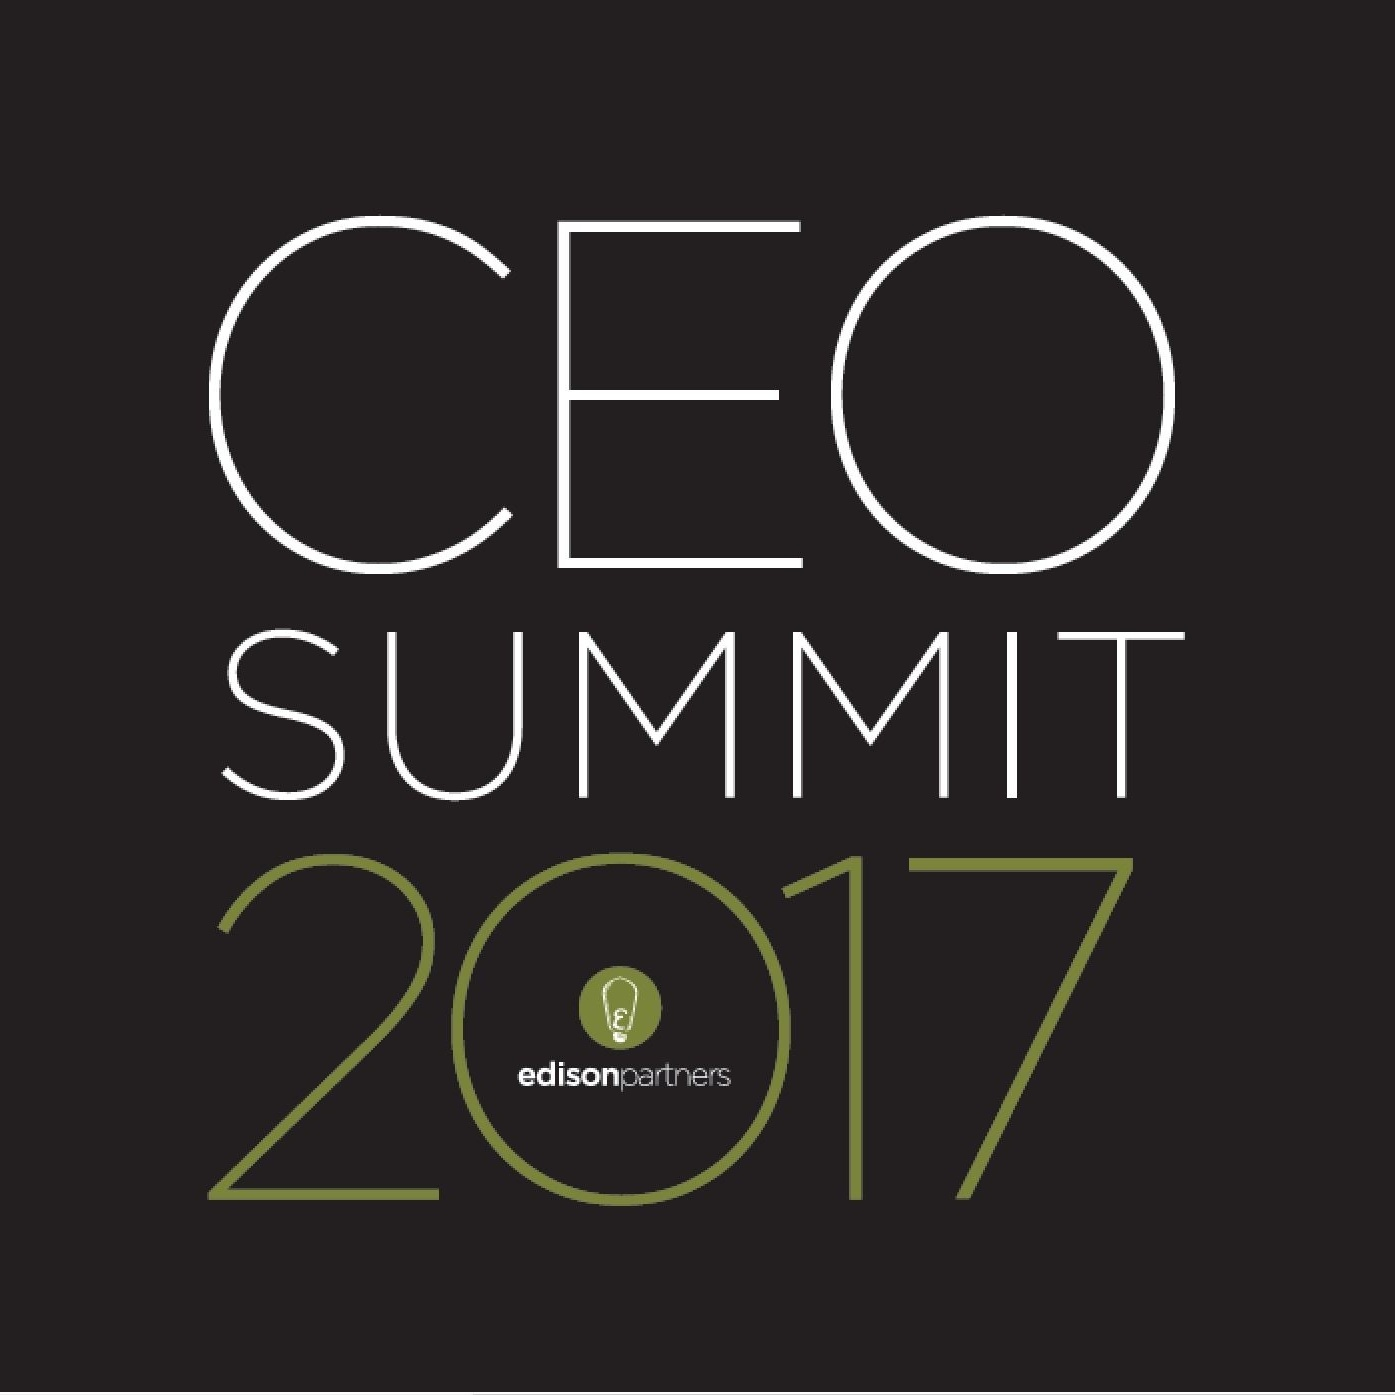 2017 CEO Summit-113052-edited.jpg